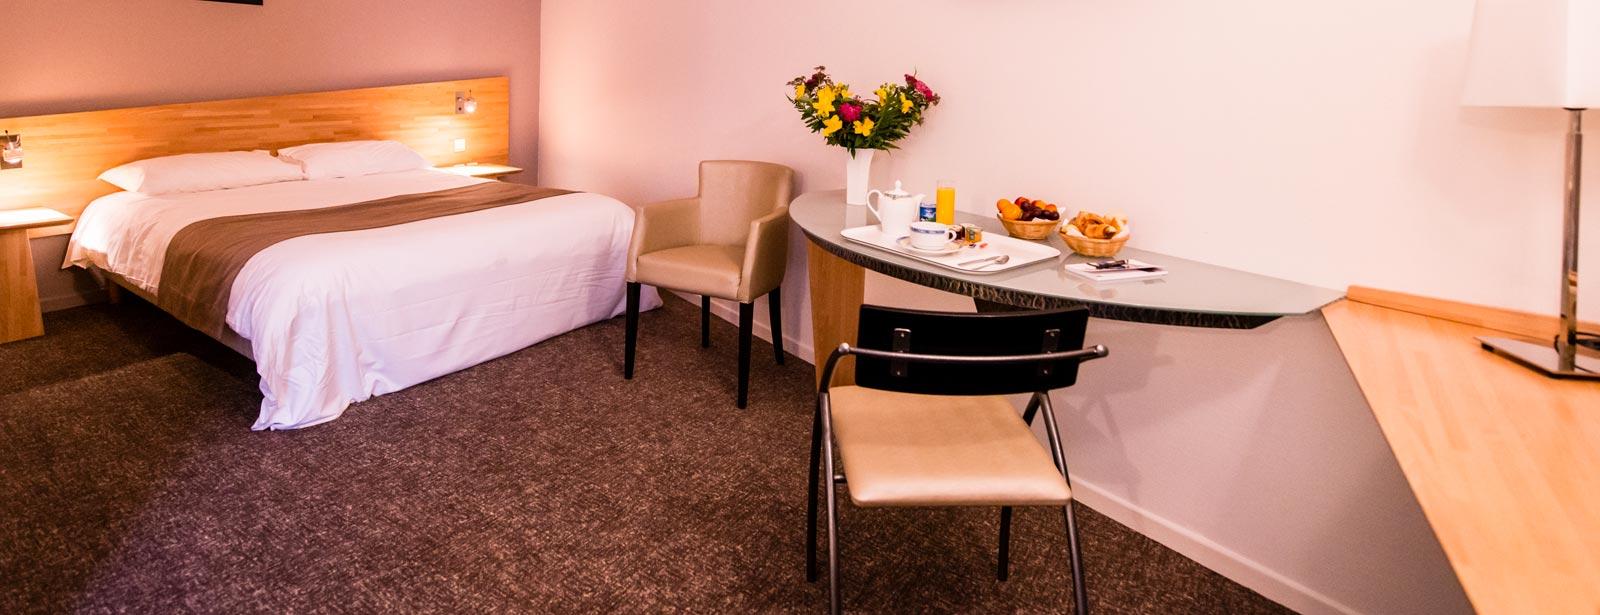 chambre famille quality Hotel pau